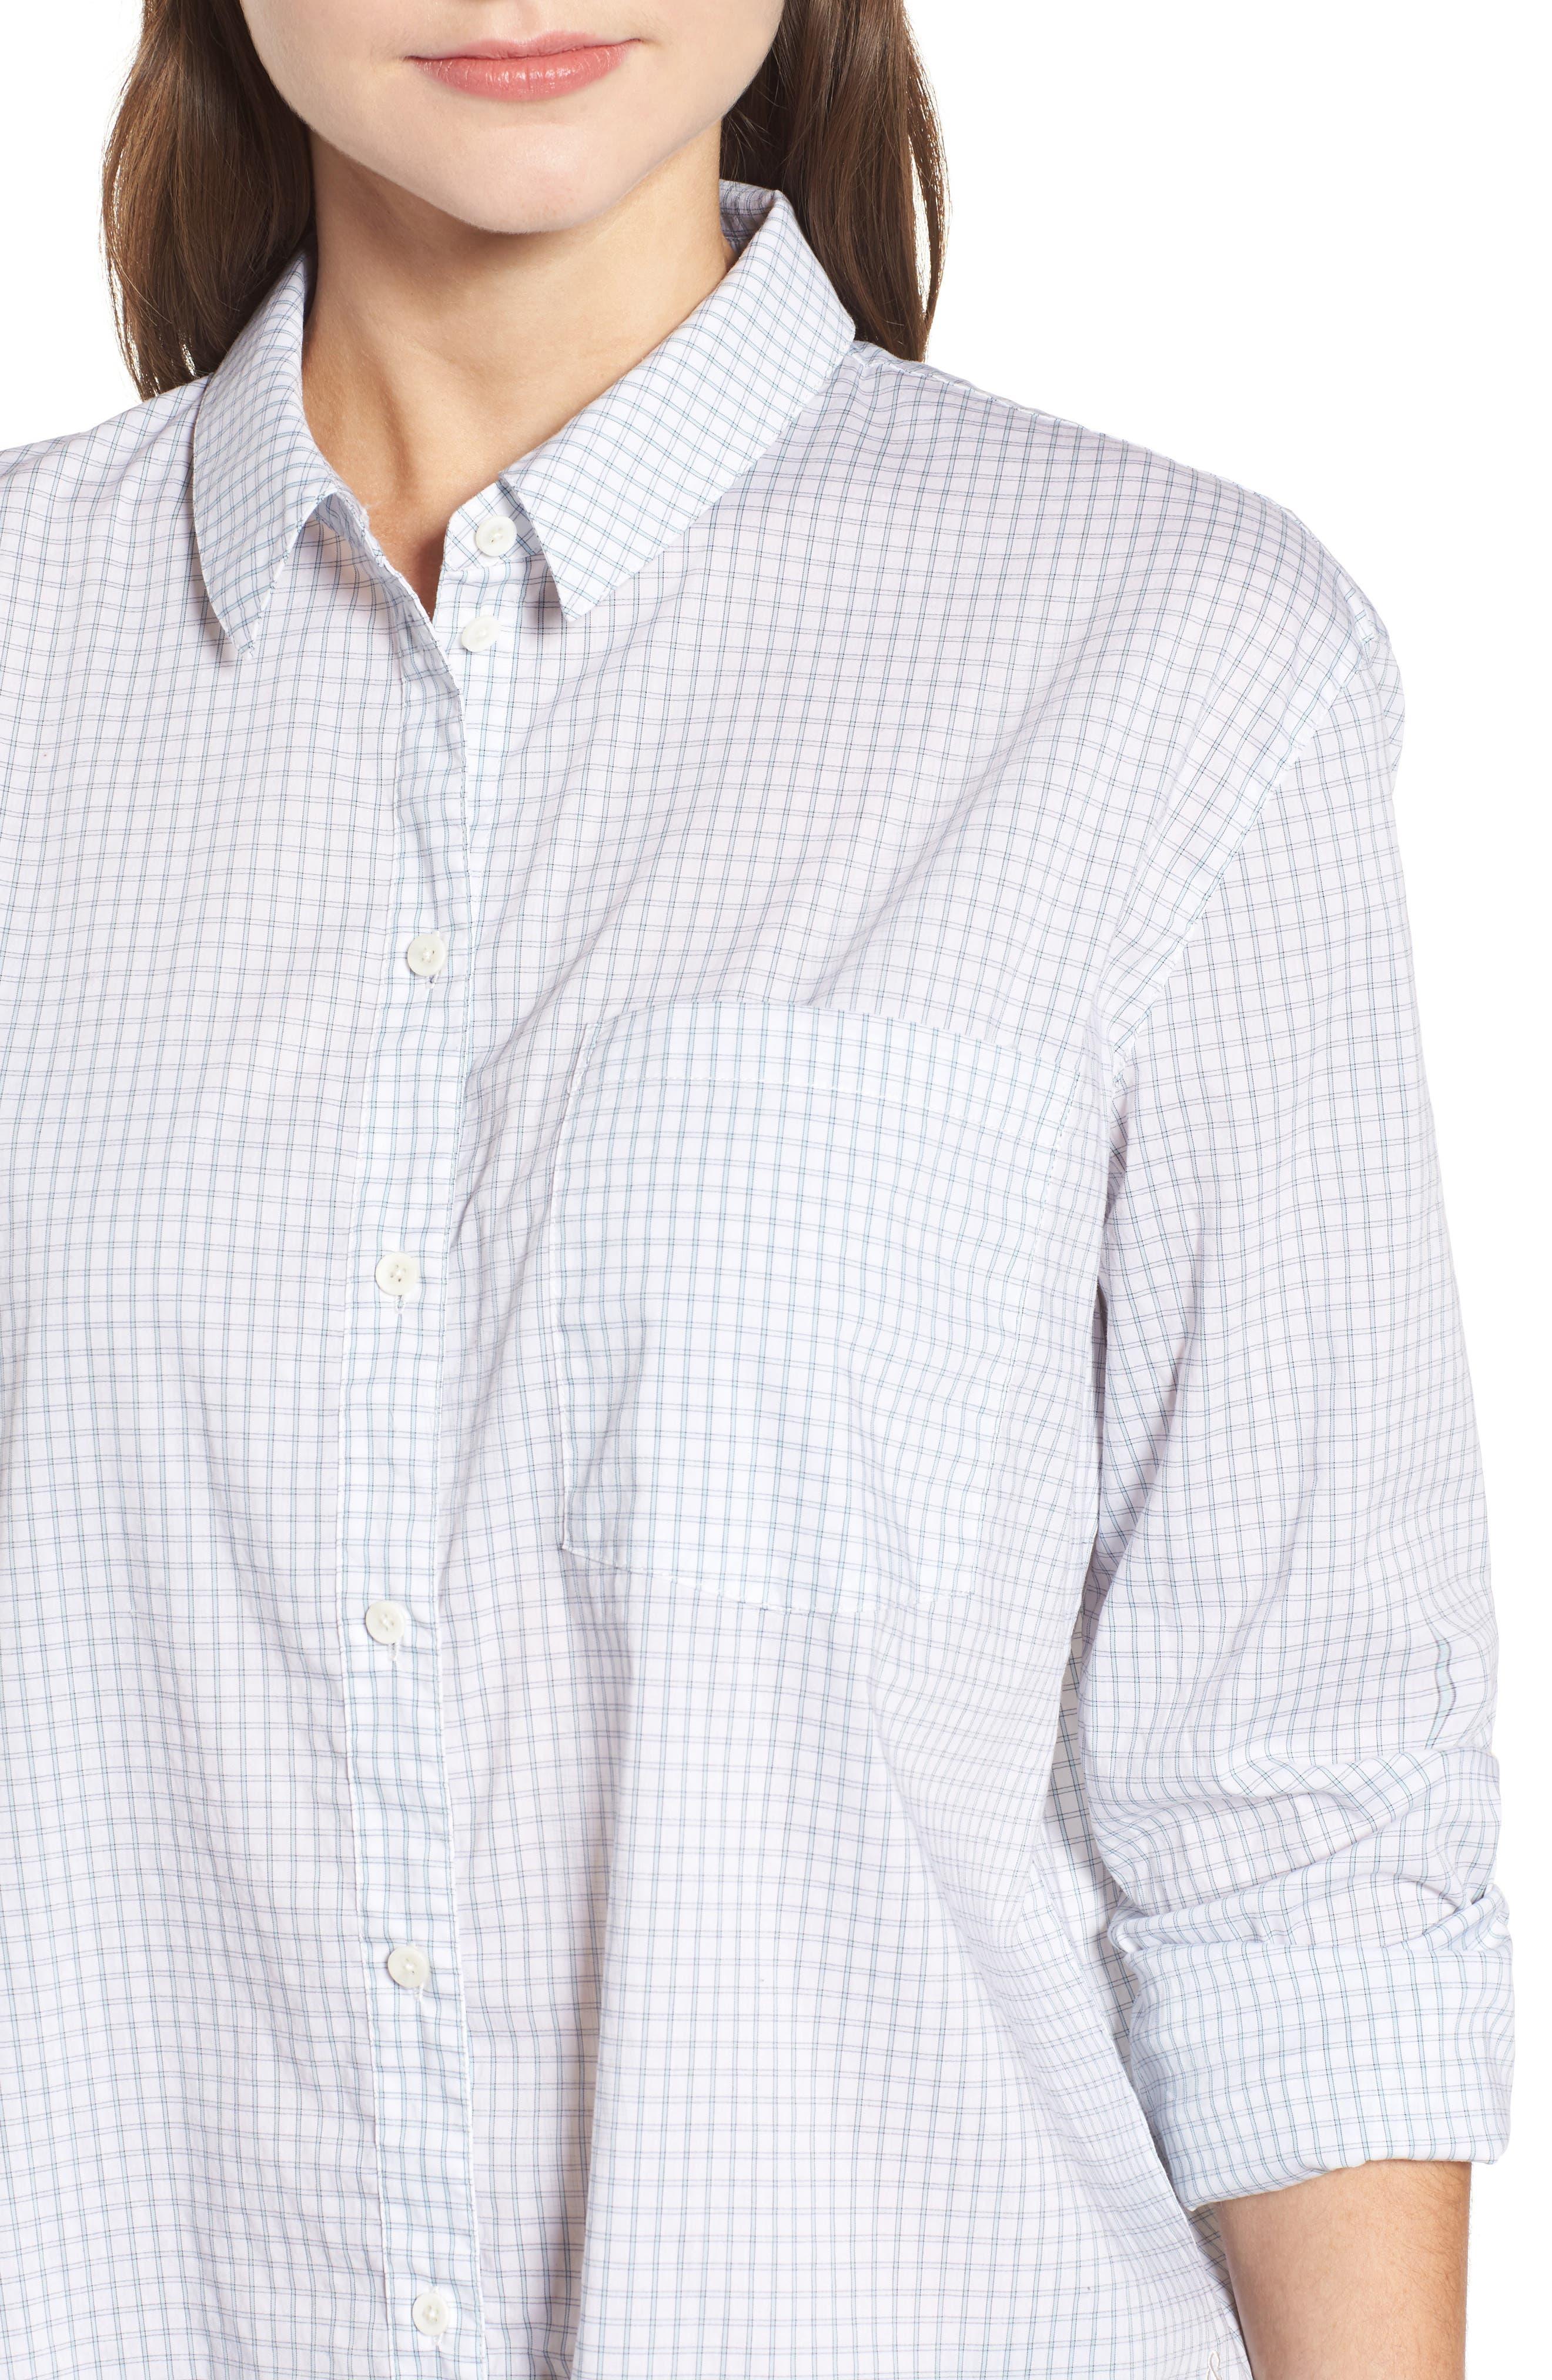 Oversize Check Shirt,                             Alternate thumbnail 4, color,                             100